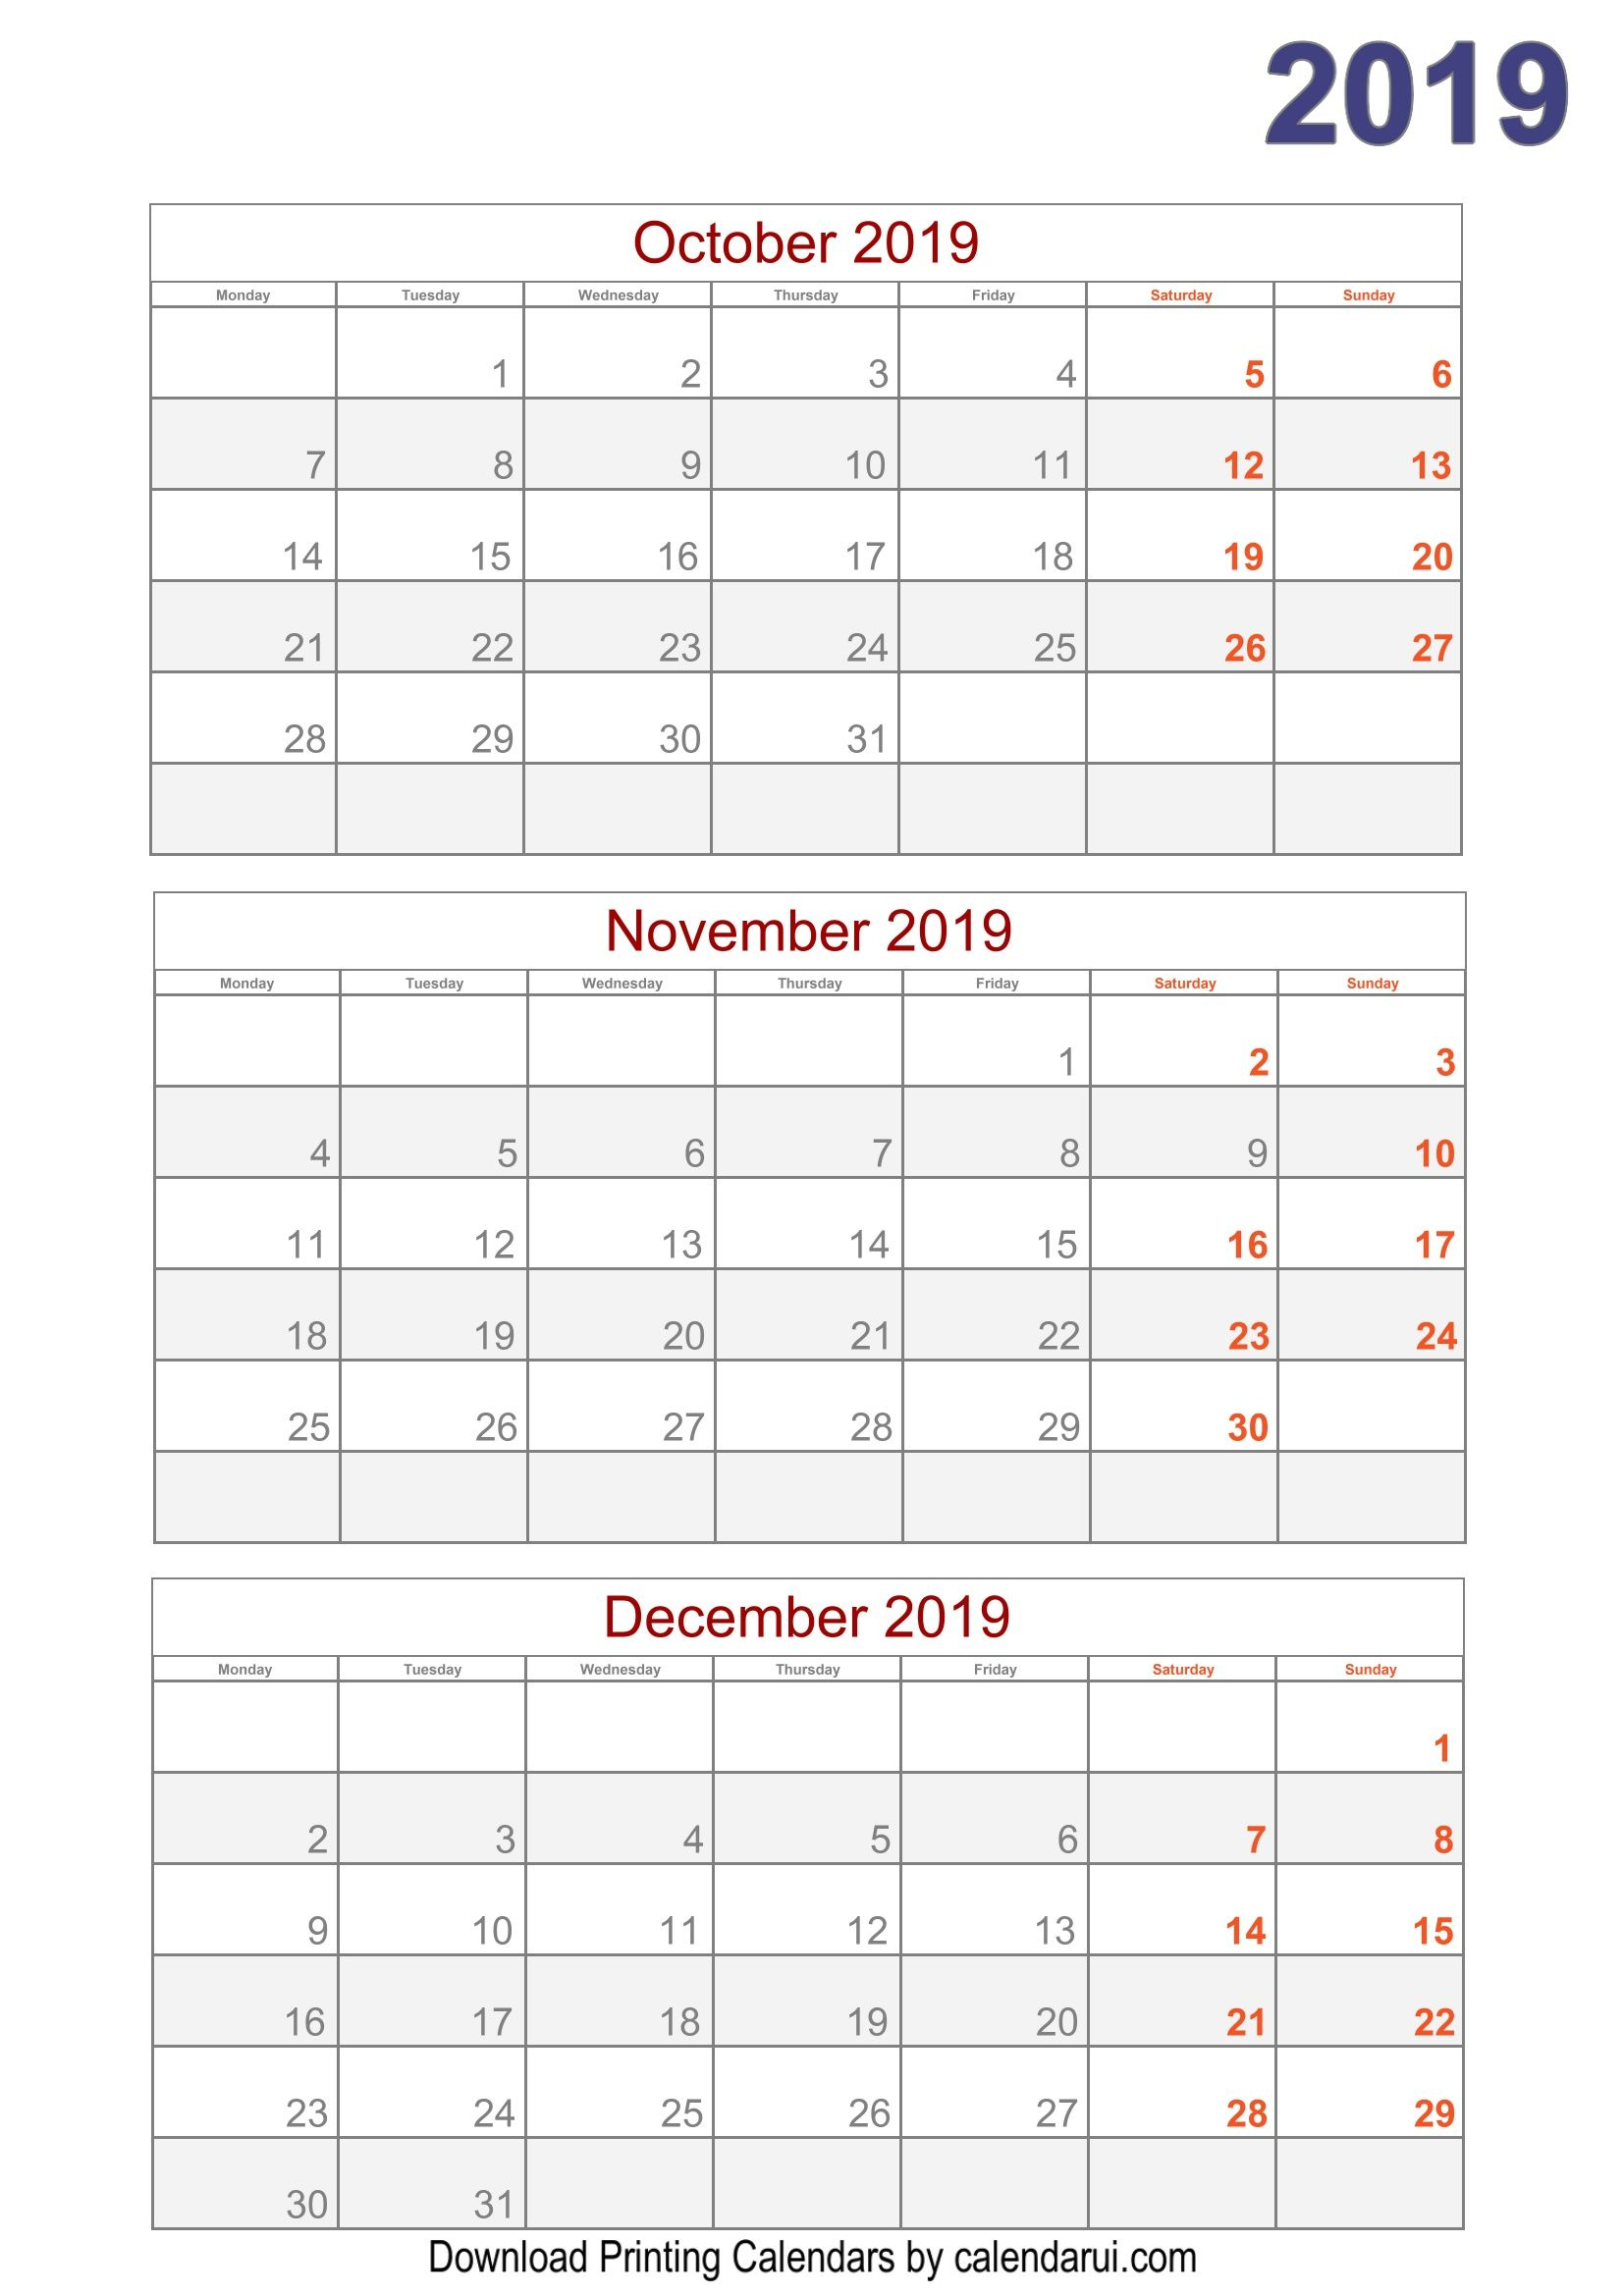 Download 2019 Quarterly Calendar Printable For Free